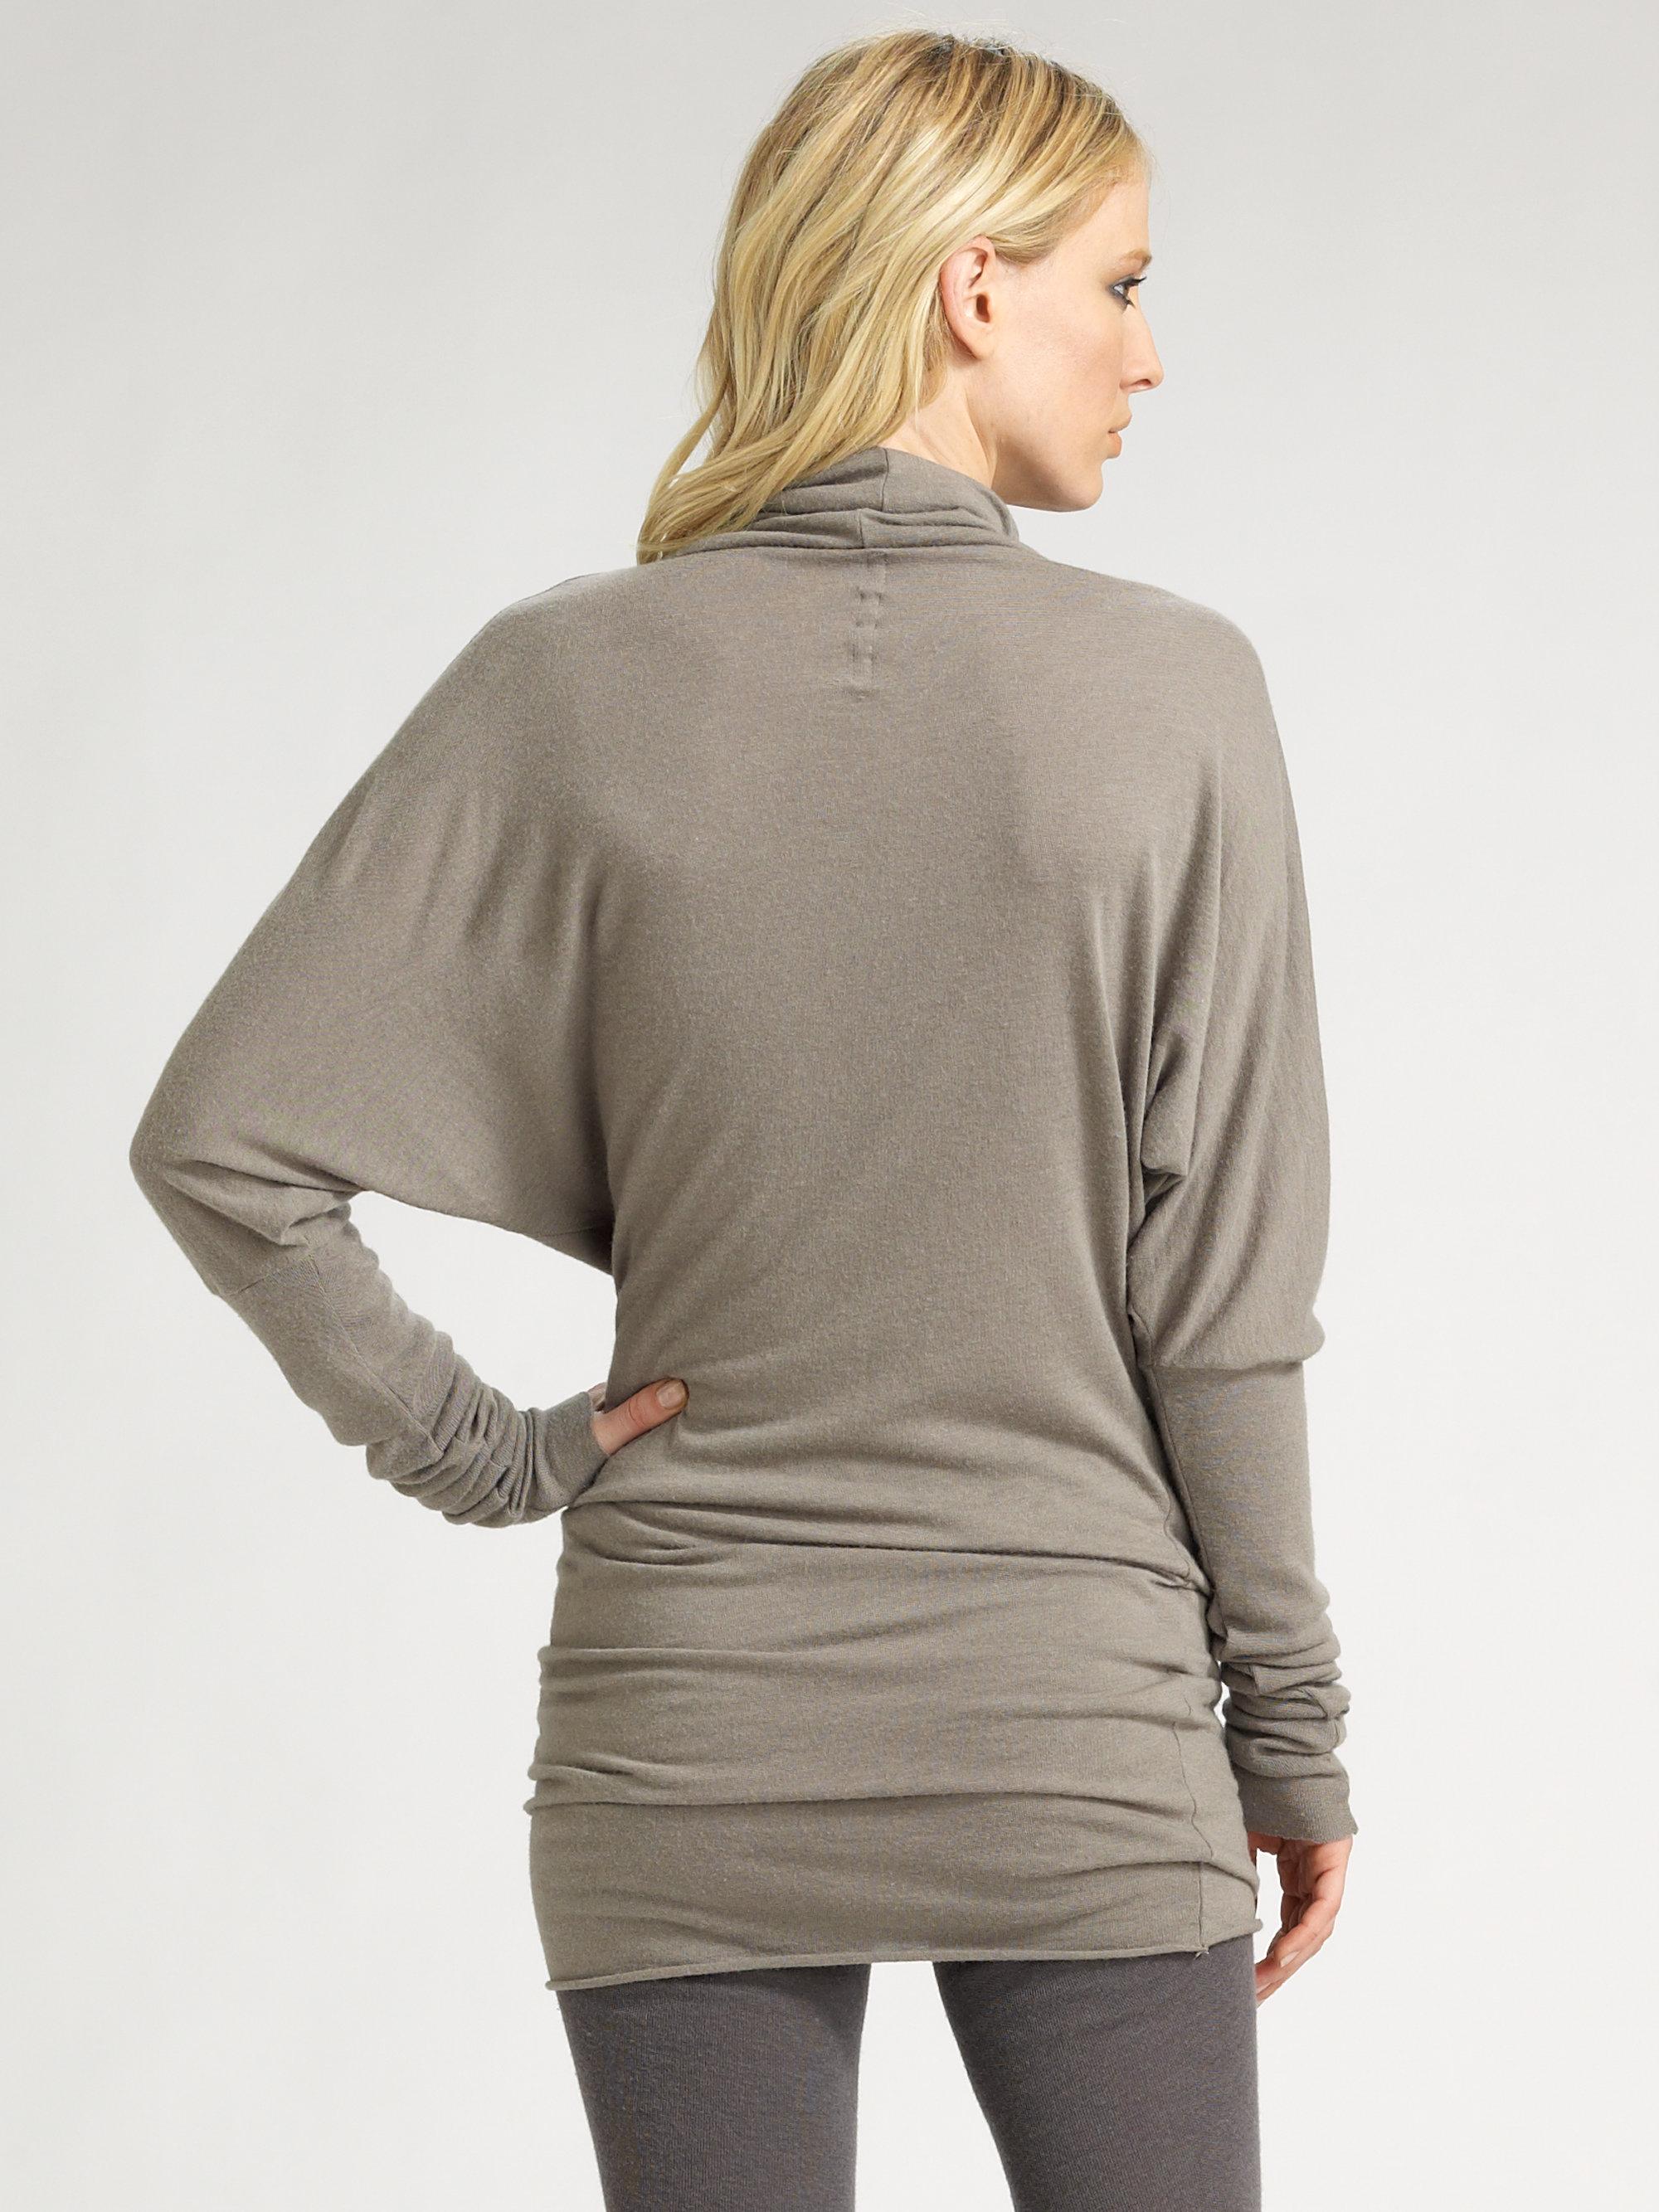 Rick owens lilies Dolman Sleeve Tunic Sweater in Gray | Lyst